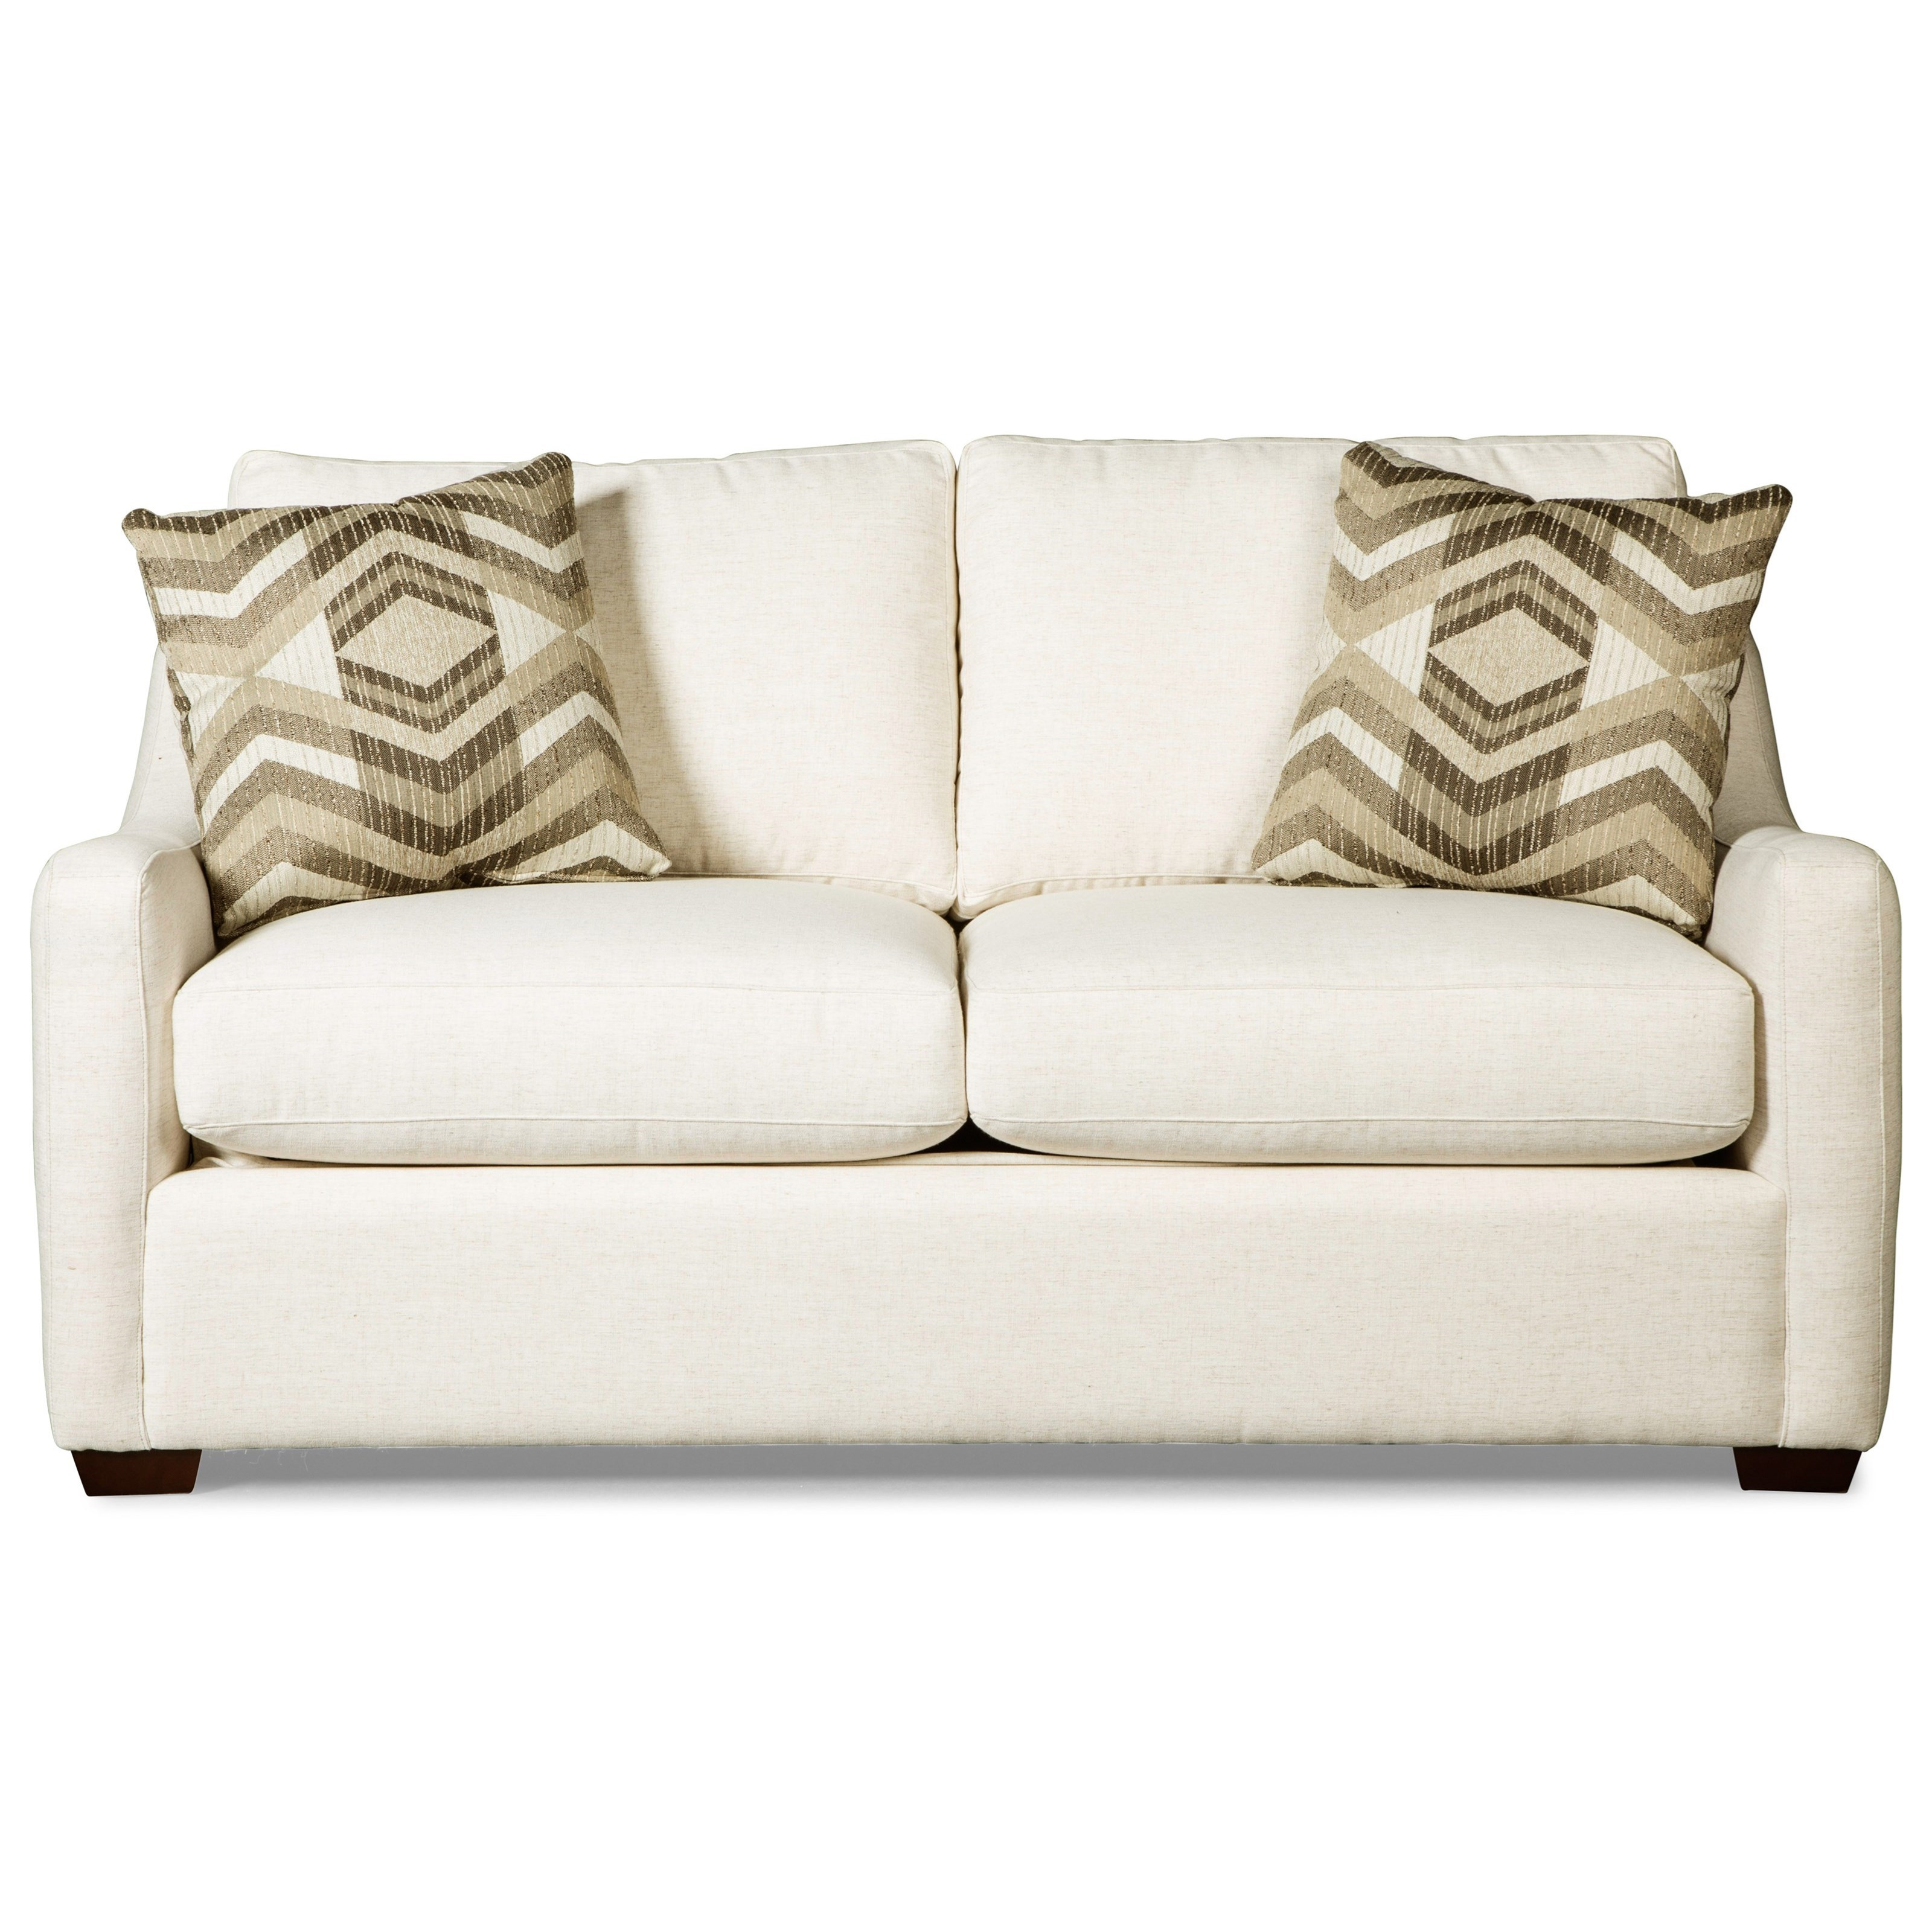 Craftmaster 7643 Full Size Sleeper Sofa Boulevard Home Furnishings Sofa Sleeper